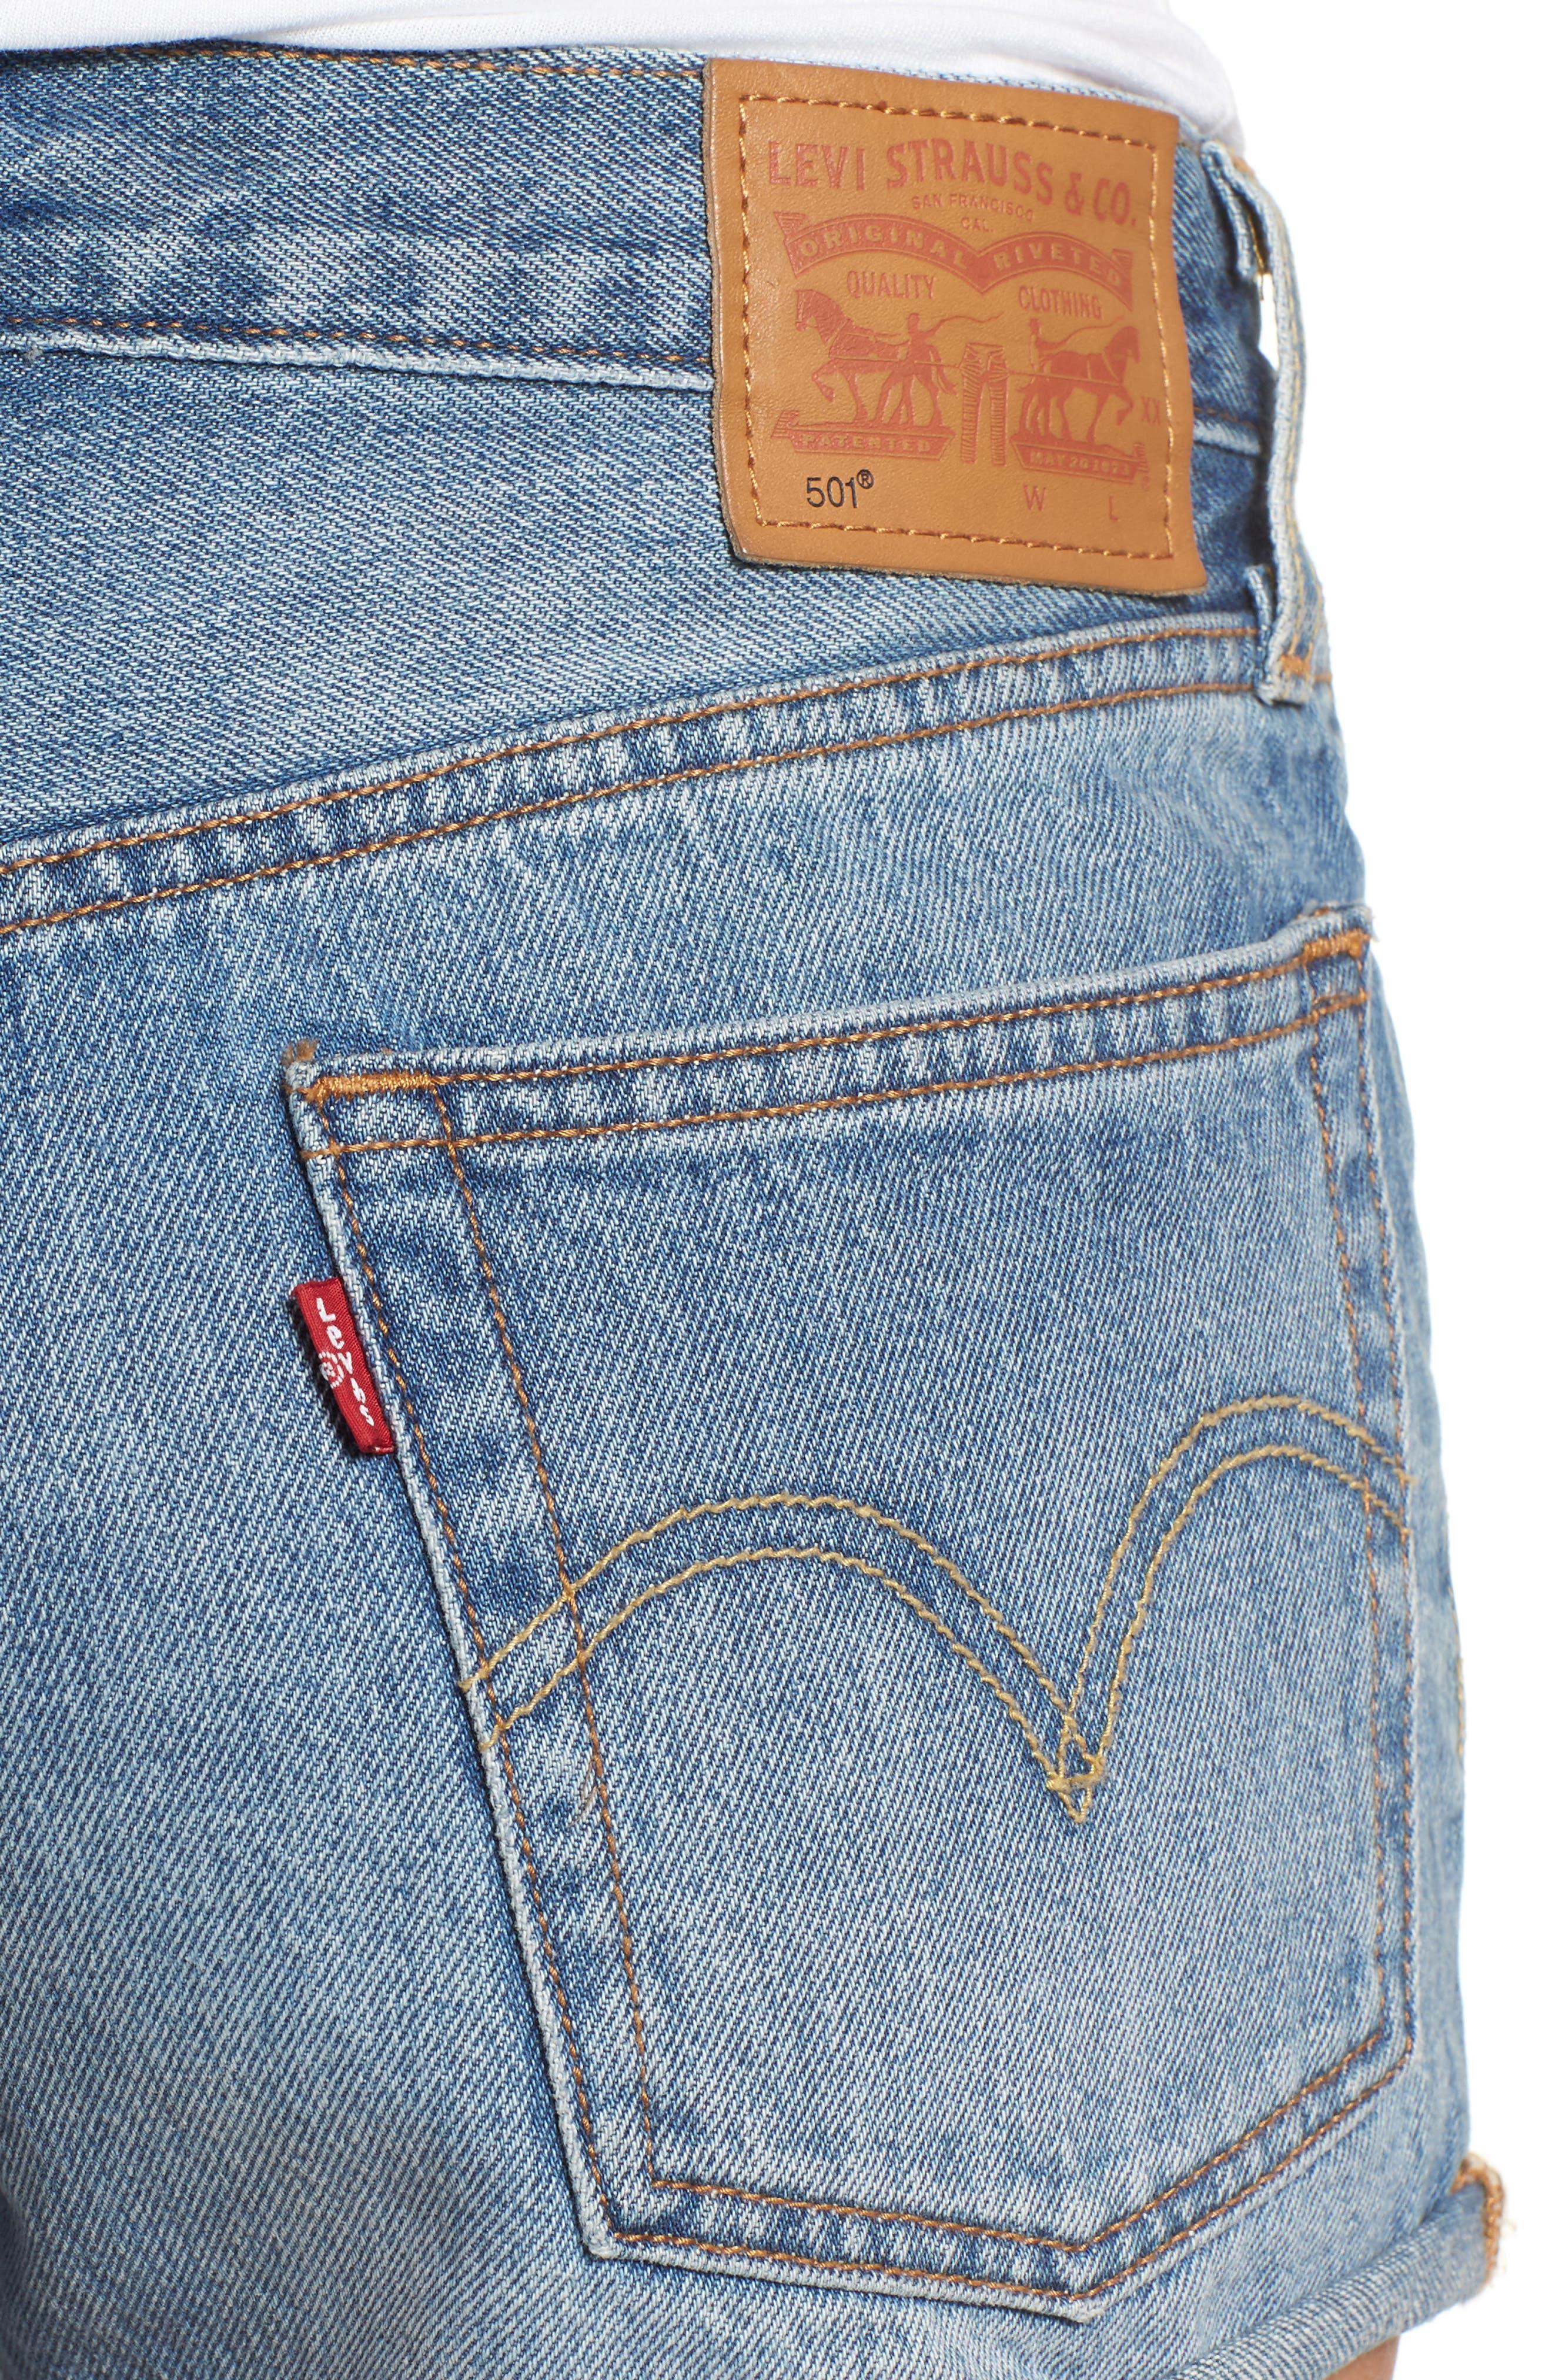 Cutoff Denim Shorts,                             Alternate thumbnail 4, color,                             400